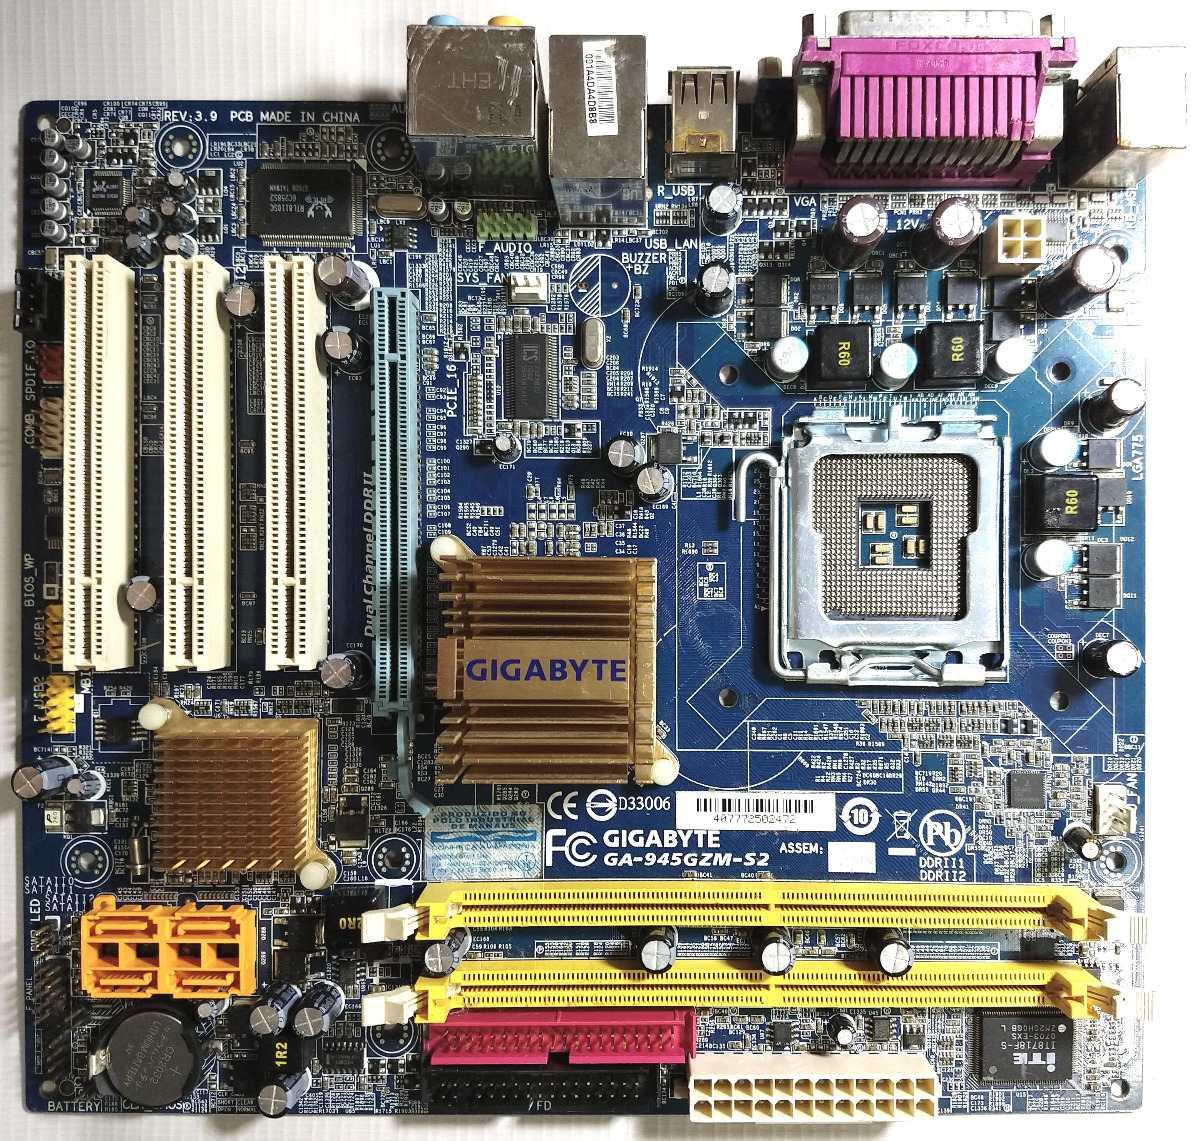 ATCOMPUTERS 945GZM-S2 WINDOWS 7 64BIT DRIVER